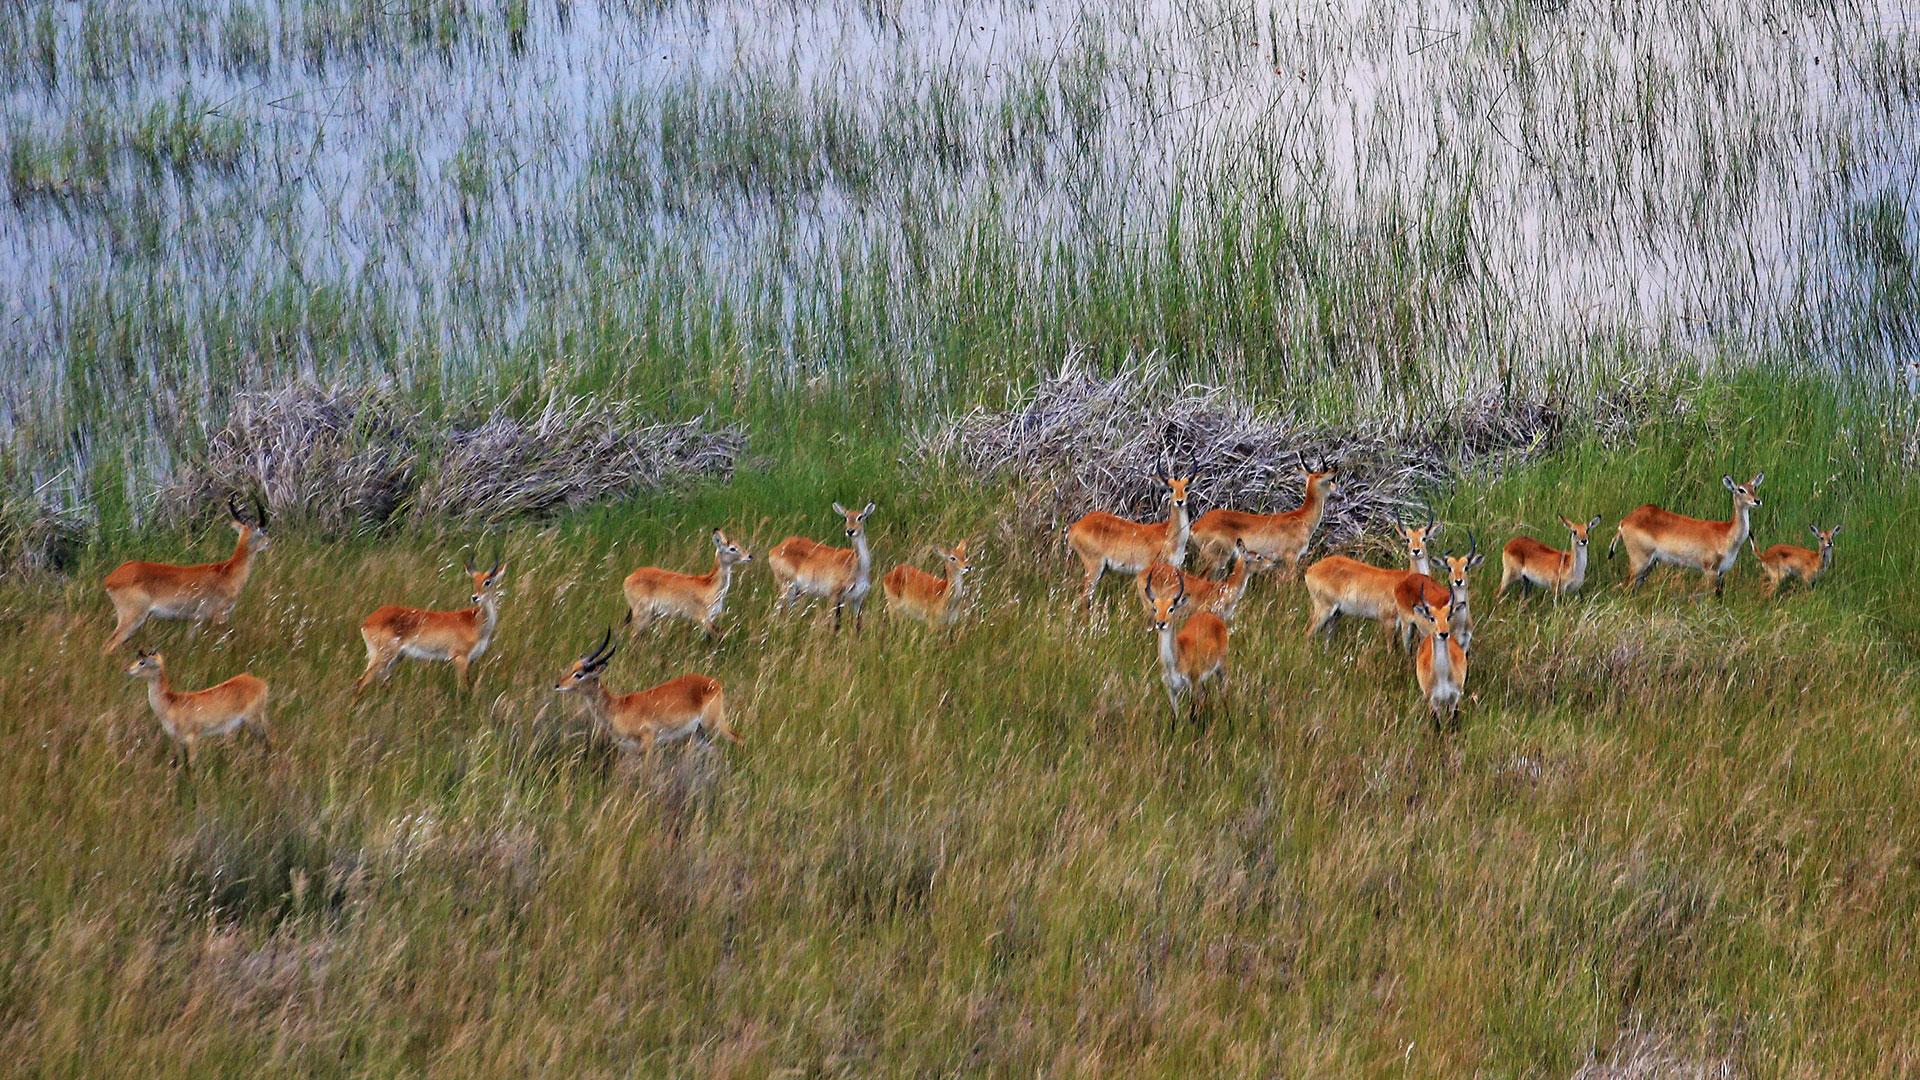 Wildlife in the floodplains of the Okavango Delta, Botswana